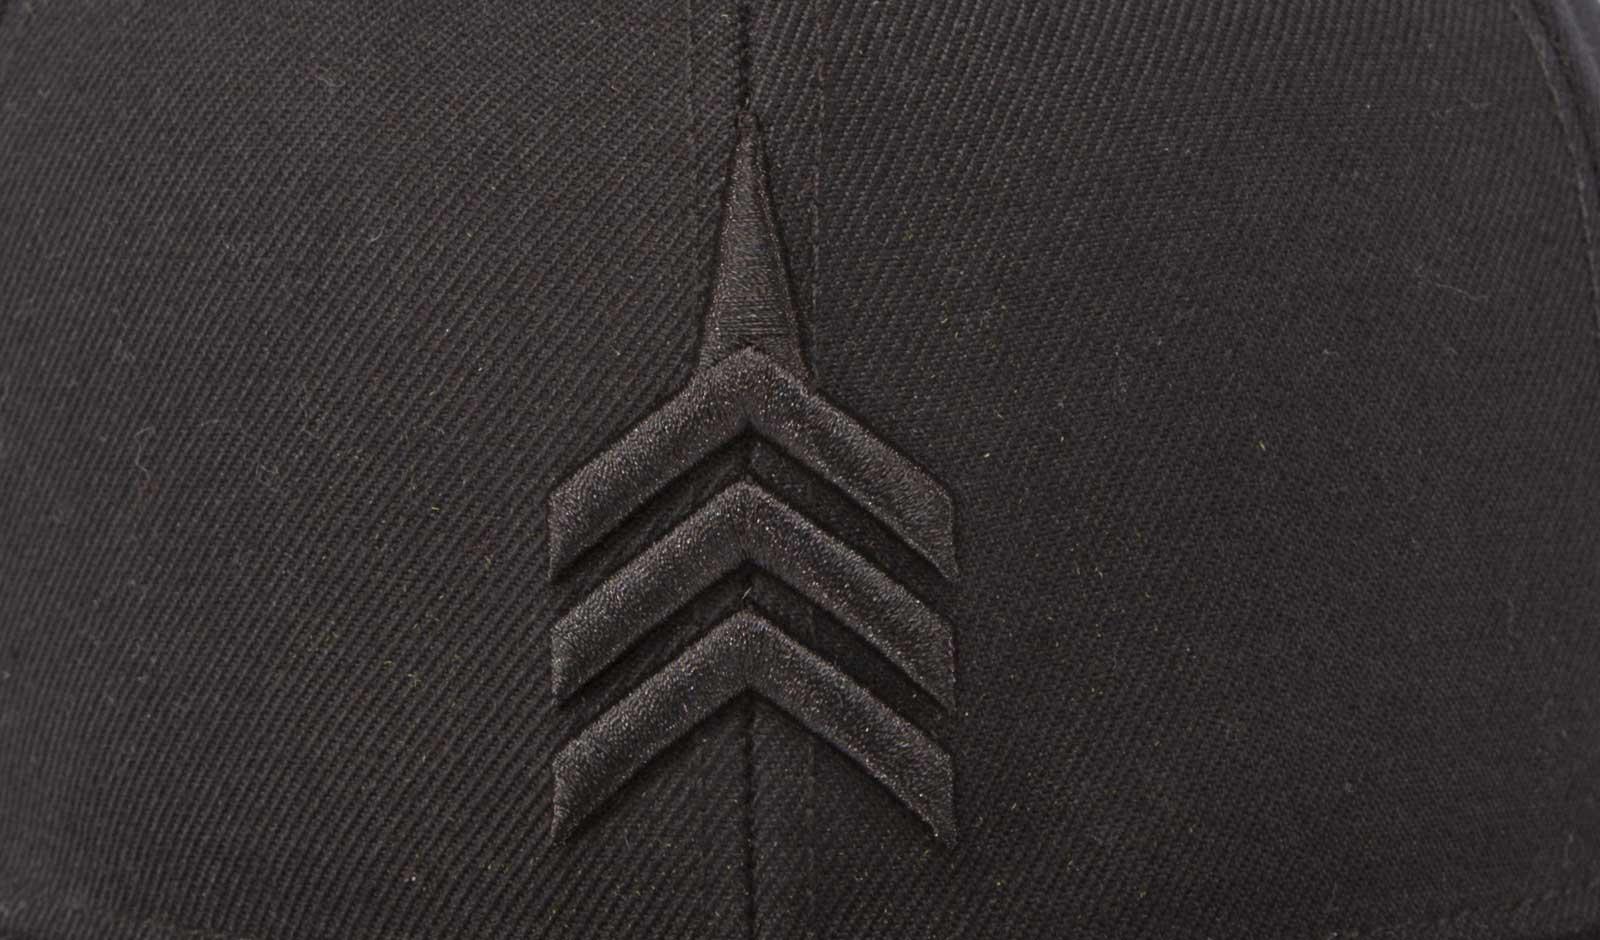 Black-on-black-3-d-embroidery.jpg